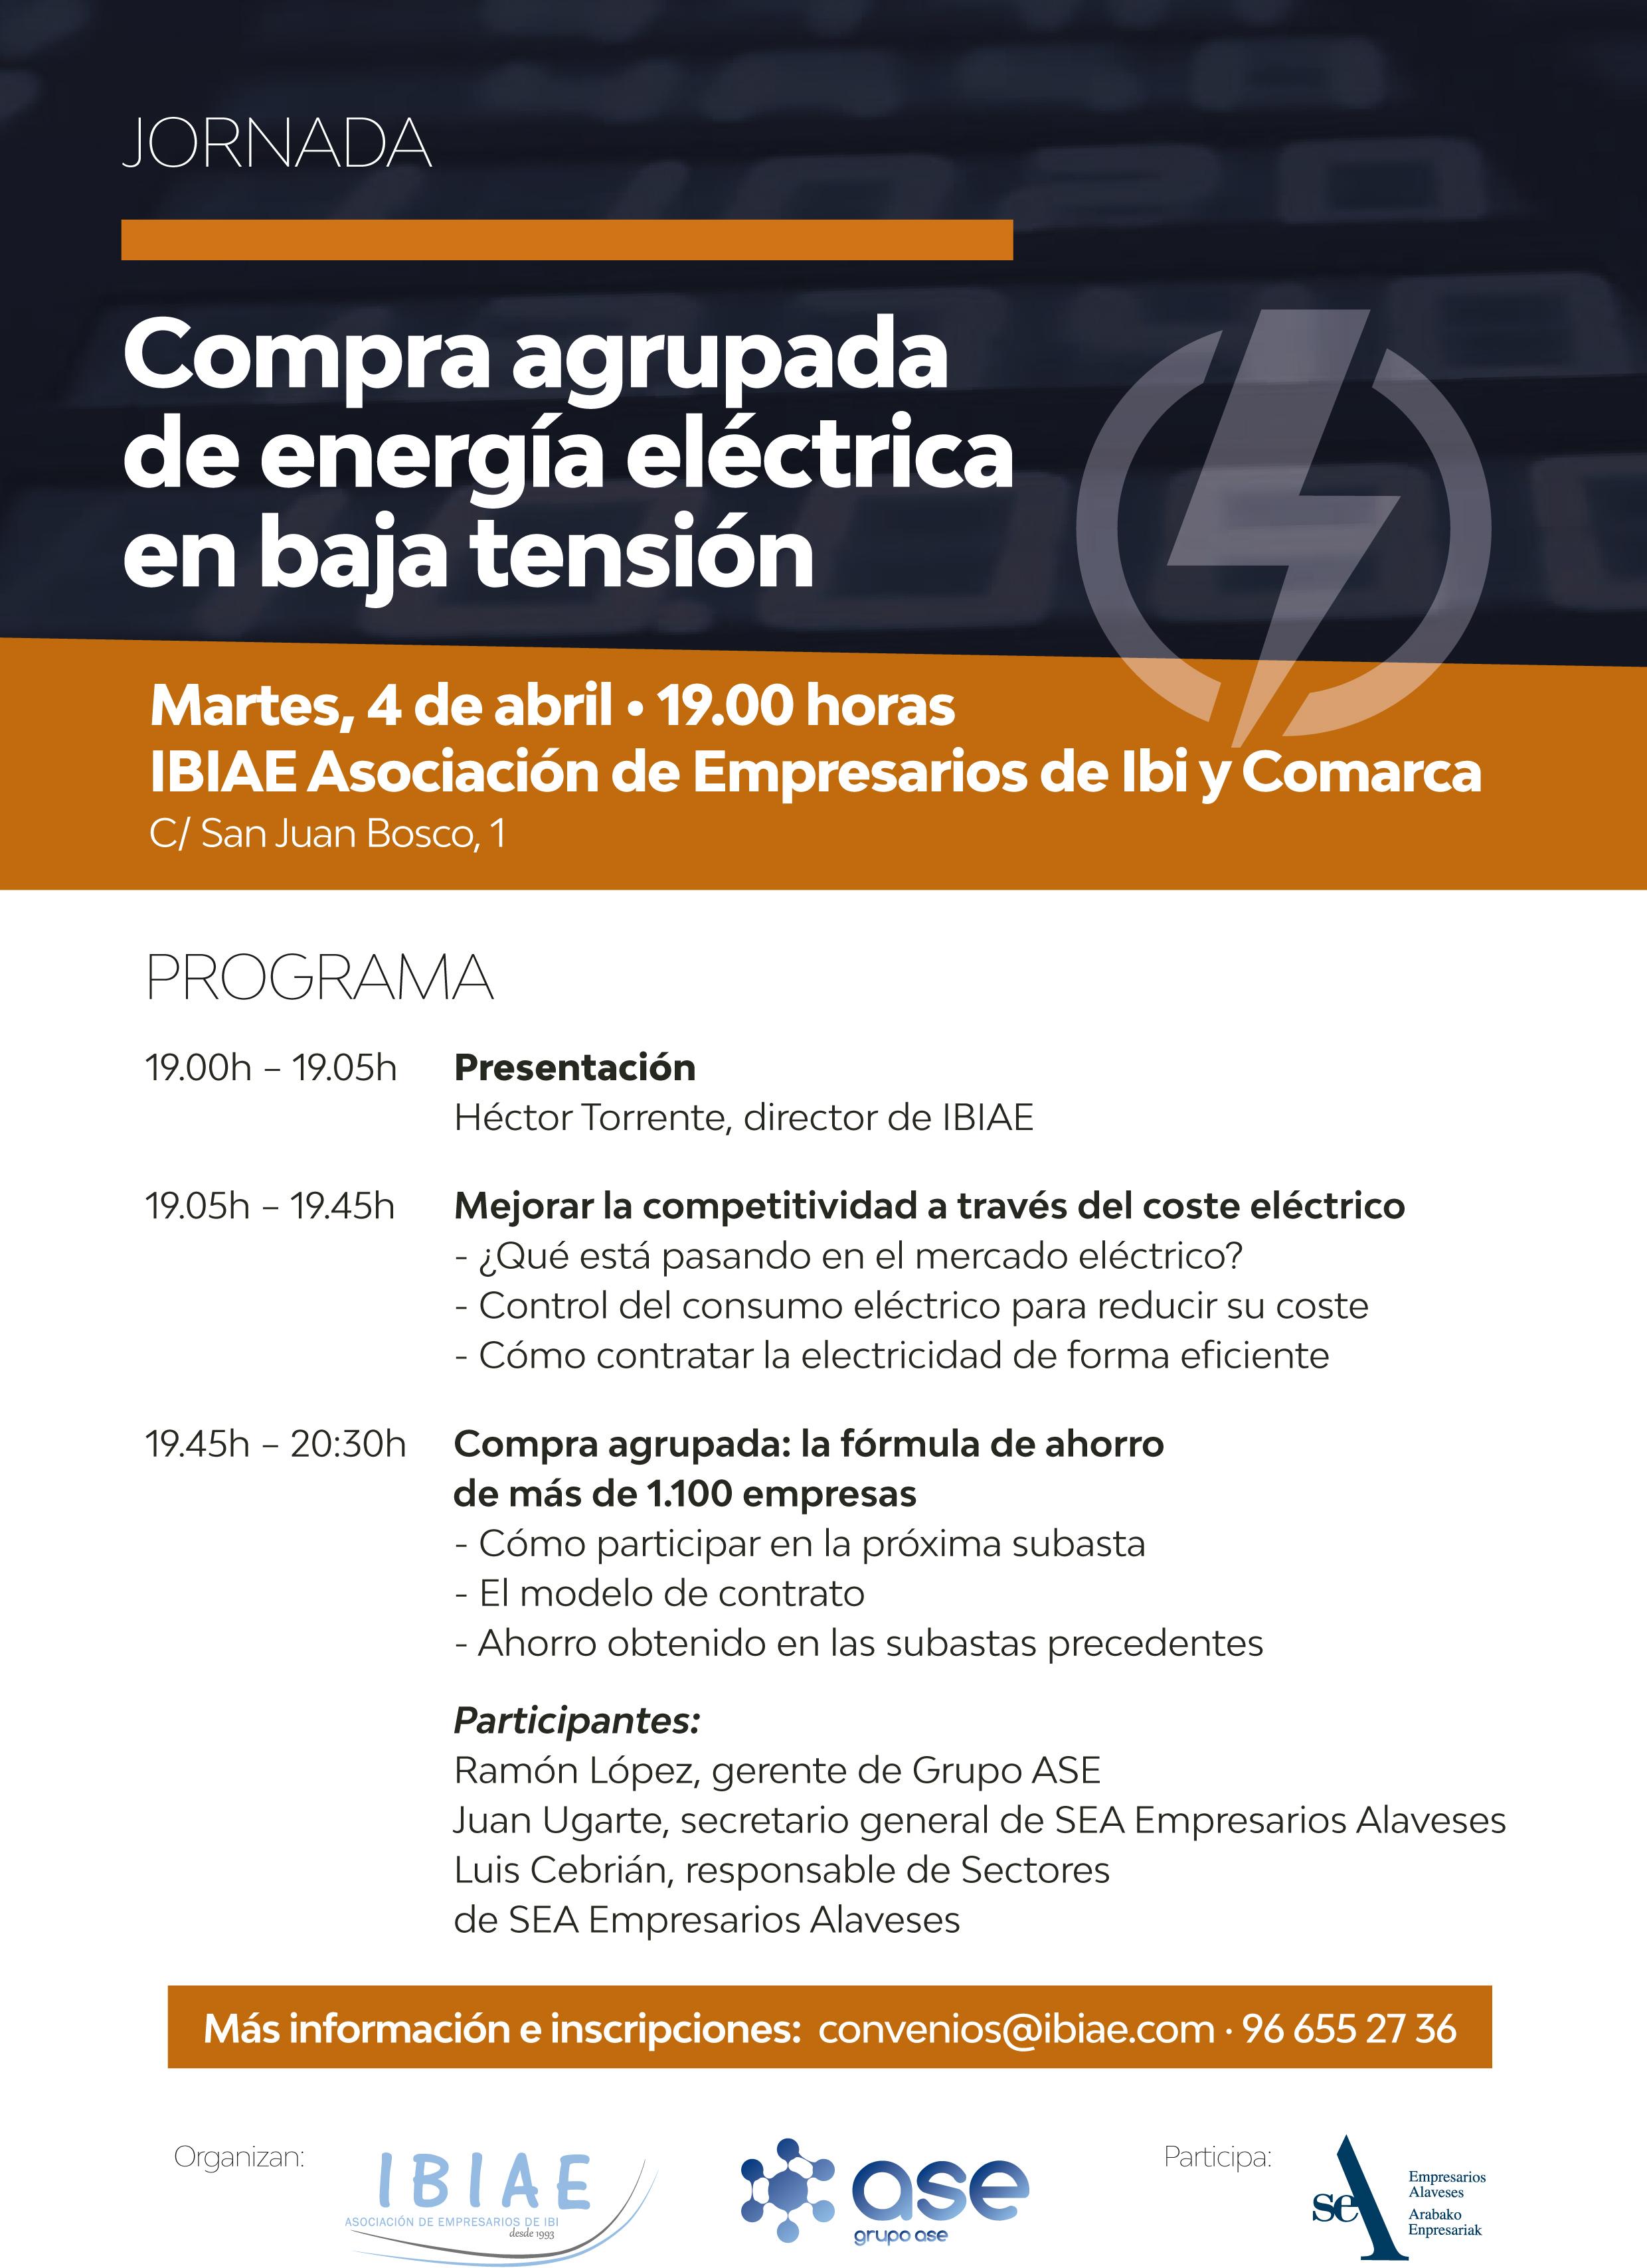 IBIAE - JORNADA COMPRA AGRUPADA DE ENERGIA